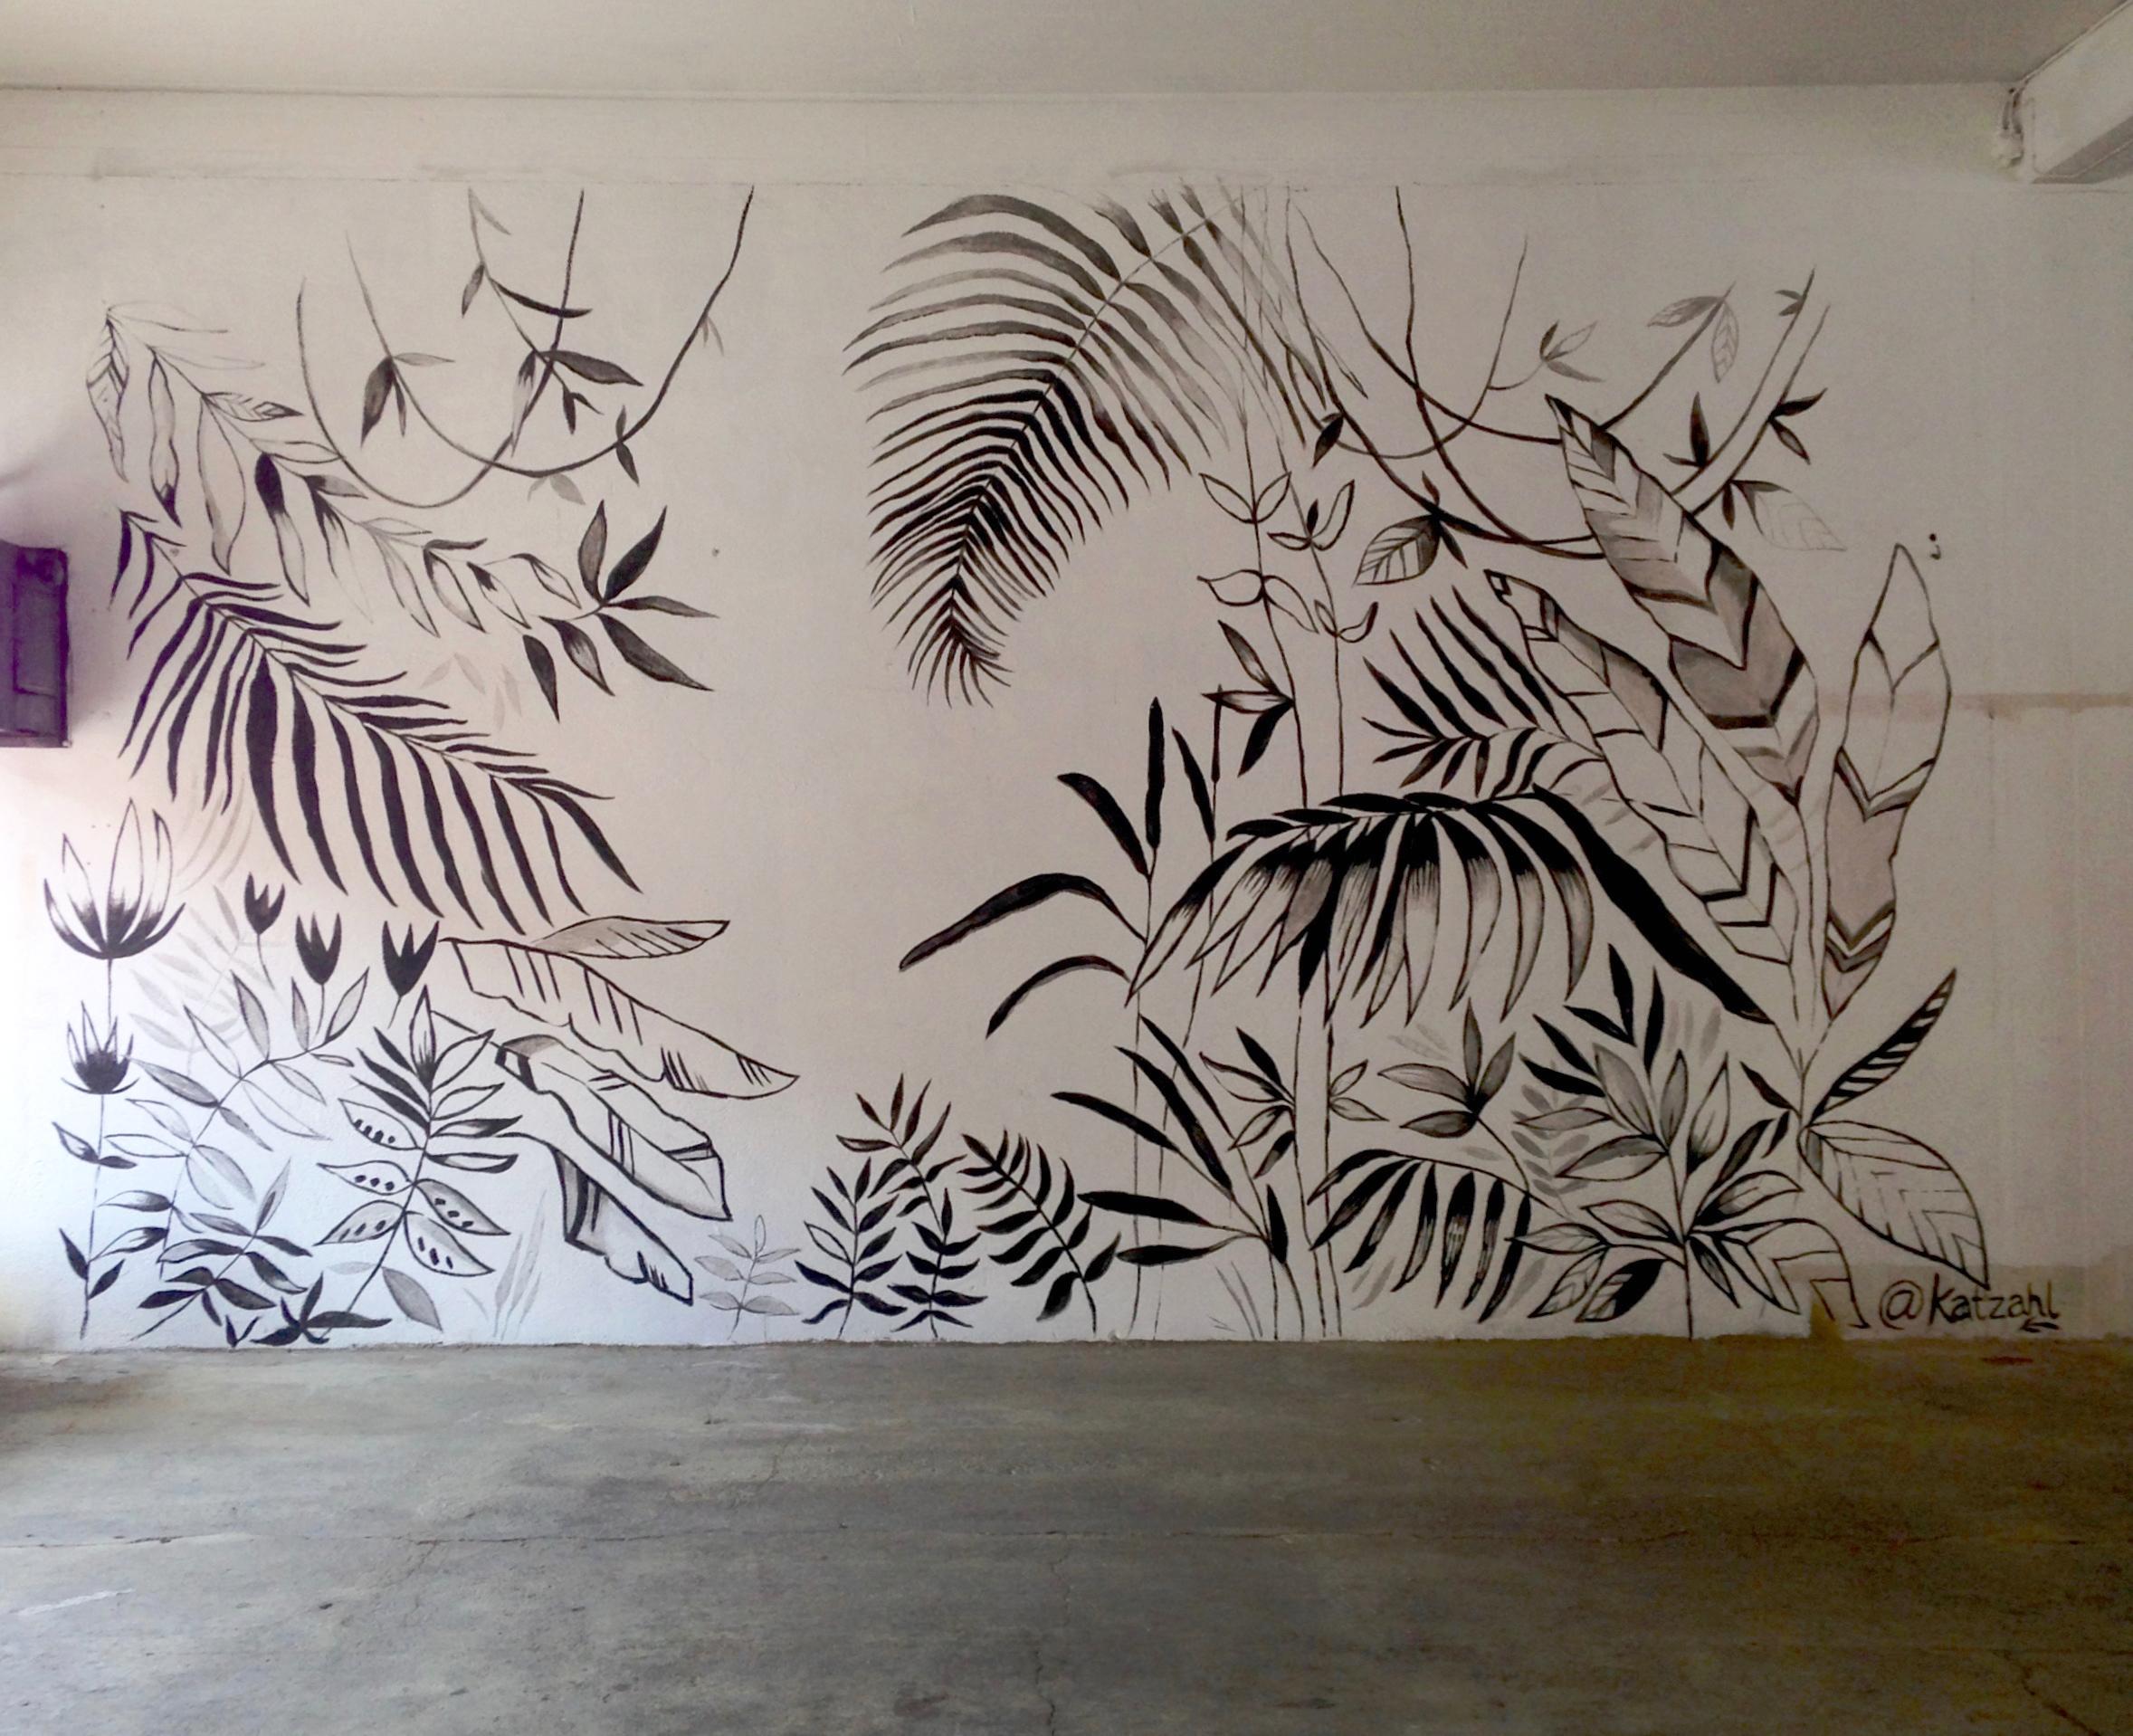 Wall Art, Lageret Studio // 2016